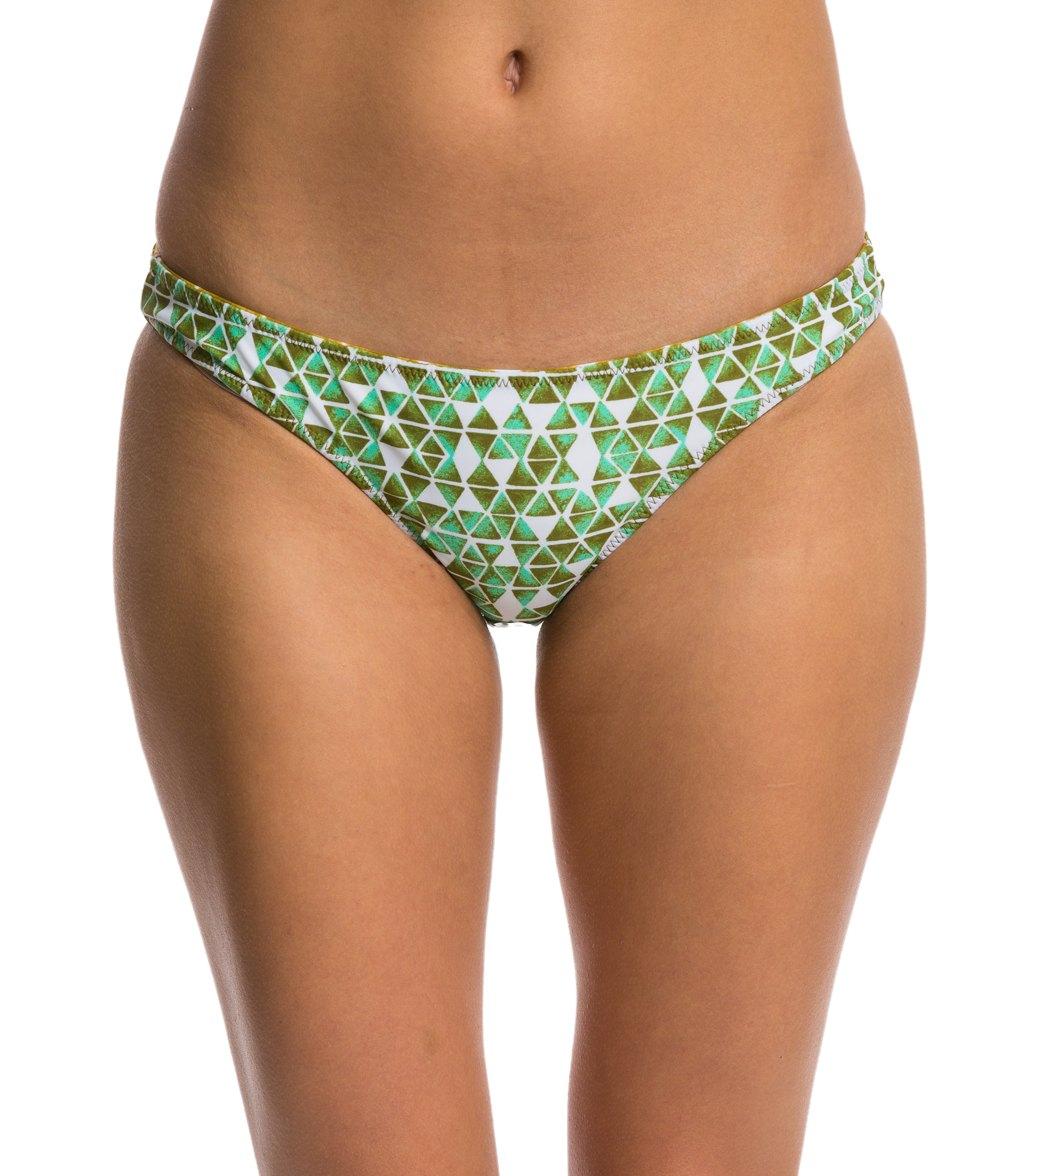 993803151a132 Volcom Swimwear Native Drift Reversible Tiny Bikini Bottom at ...